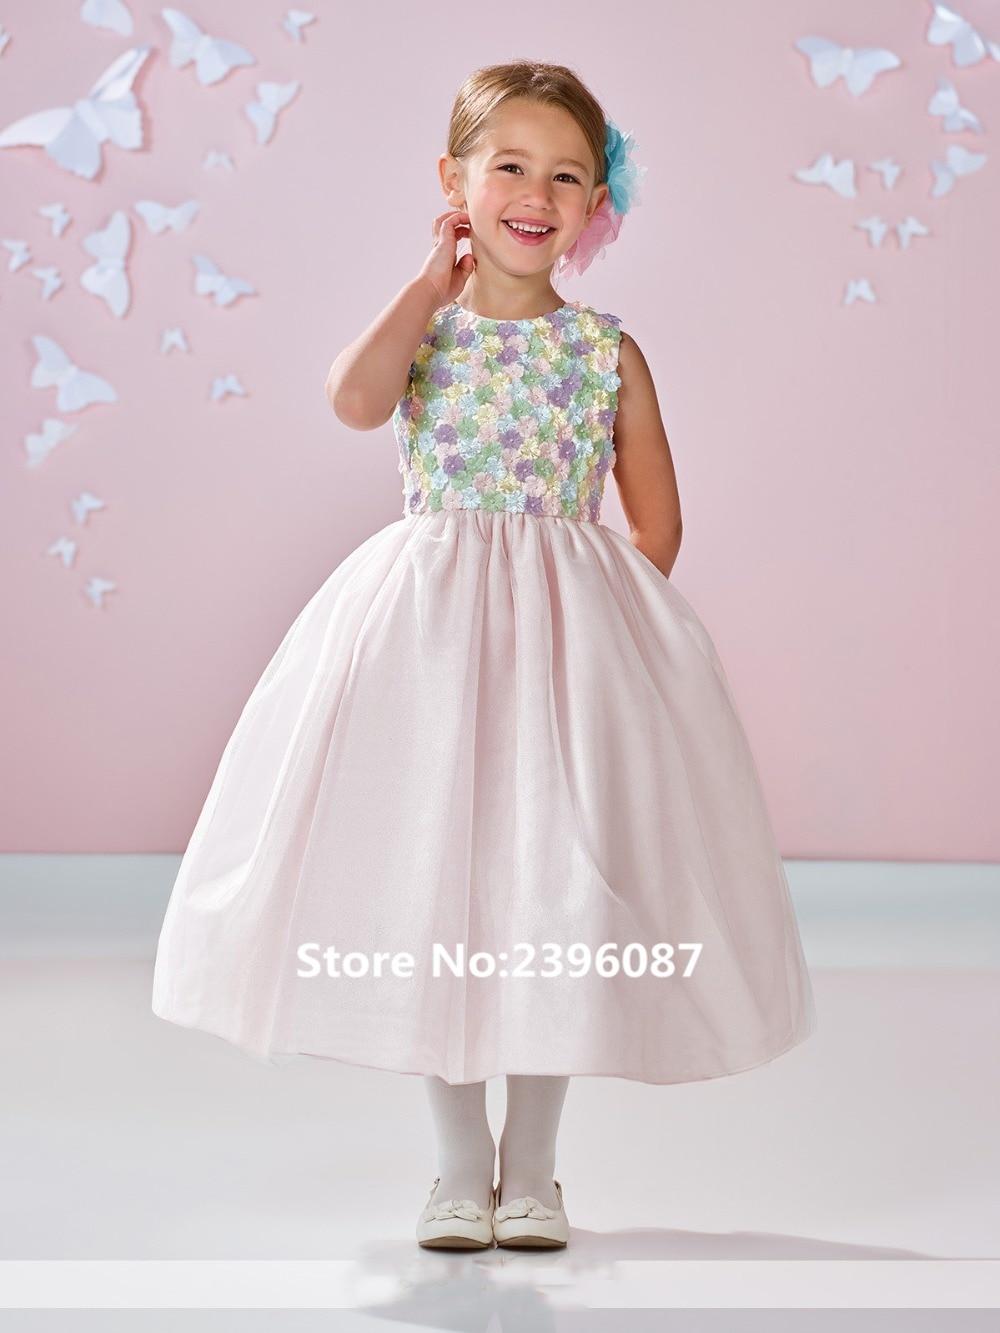 New Handmade   Flowers   Sleeveless Ball Gown   Flower     Girl     Dresses   Cheap Tea-Length Communion   Dresses     Dress   vestidos de comunion 2019